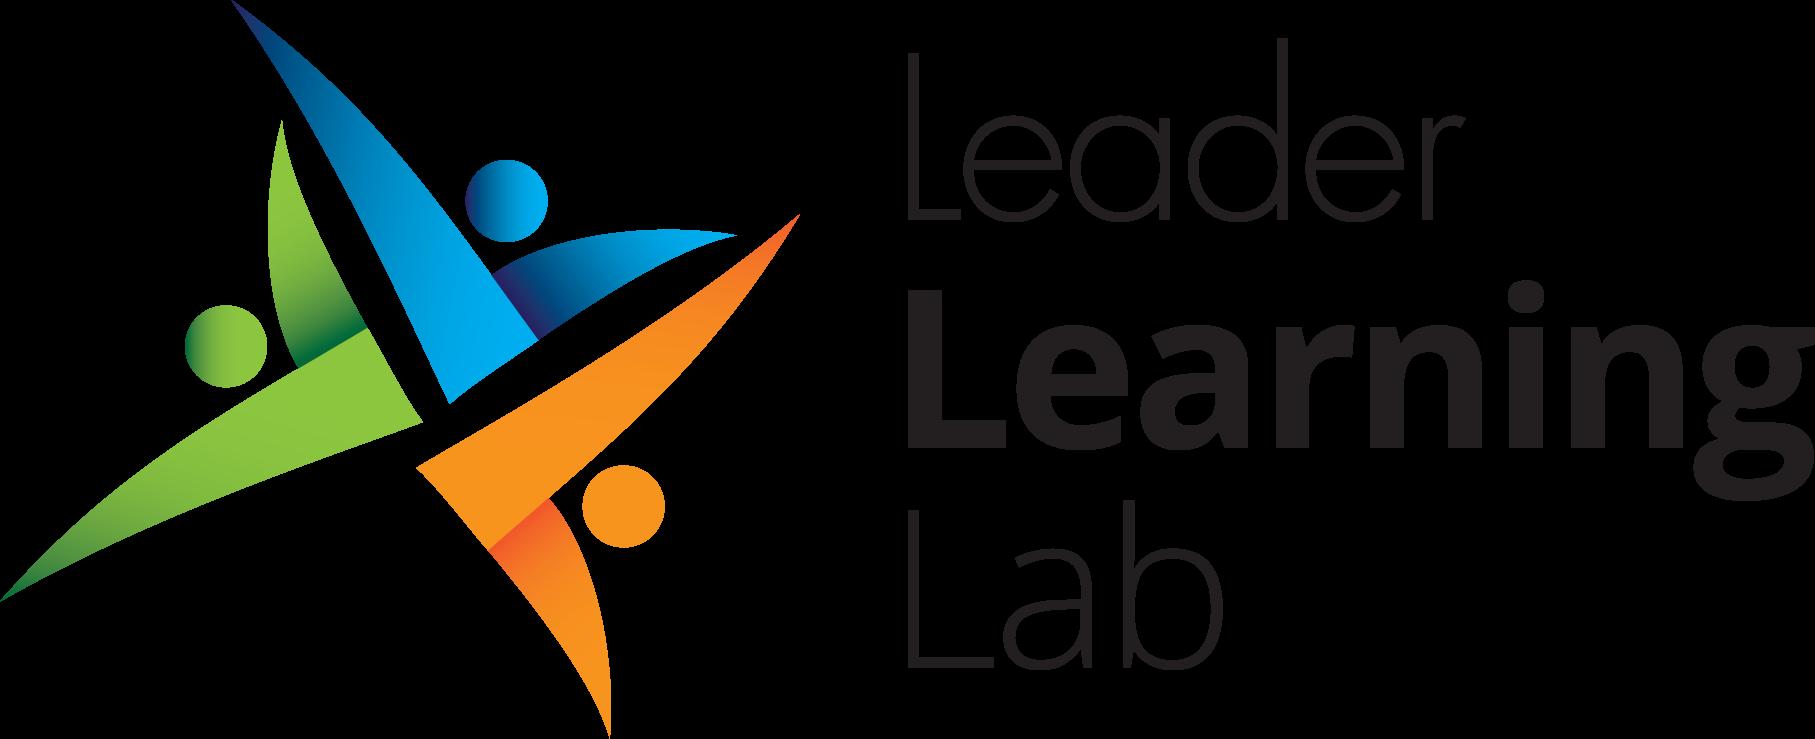 New HR Logo for Leader Learning Lab